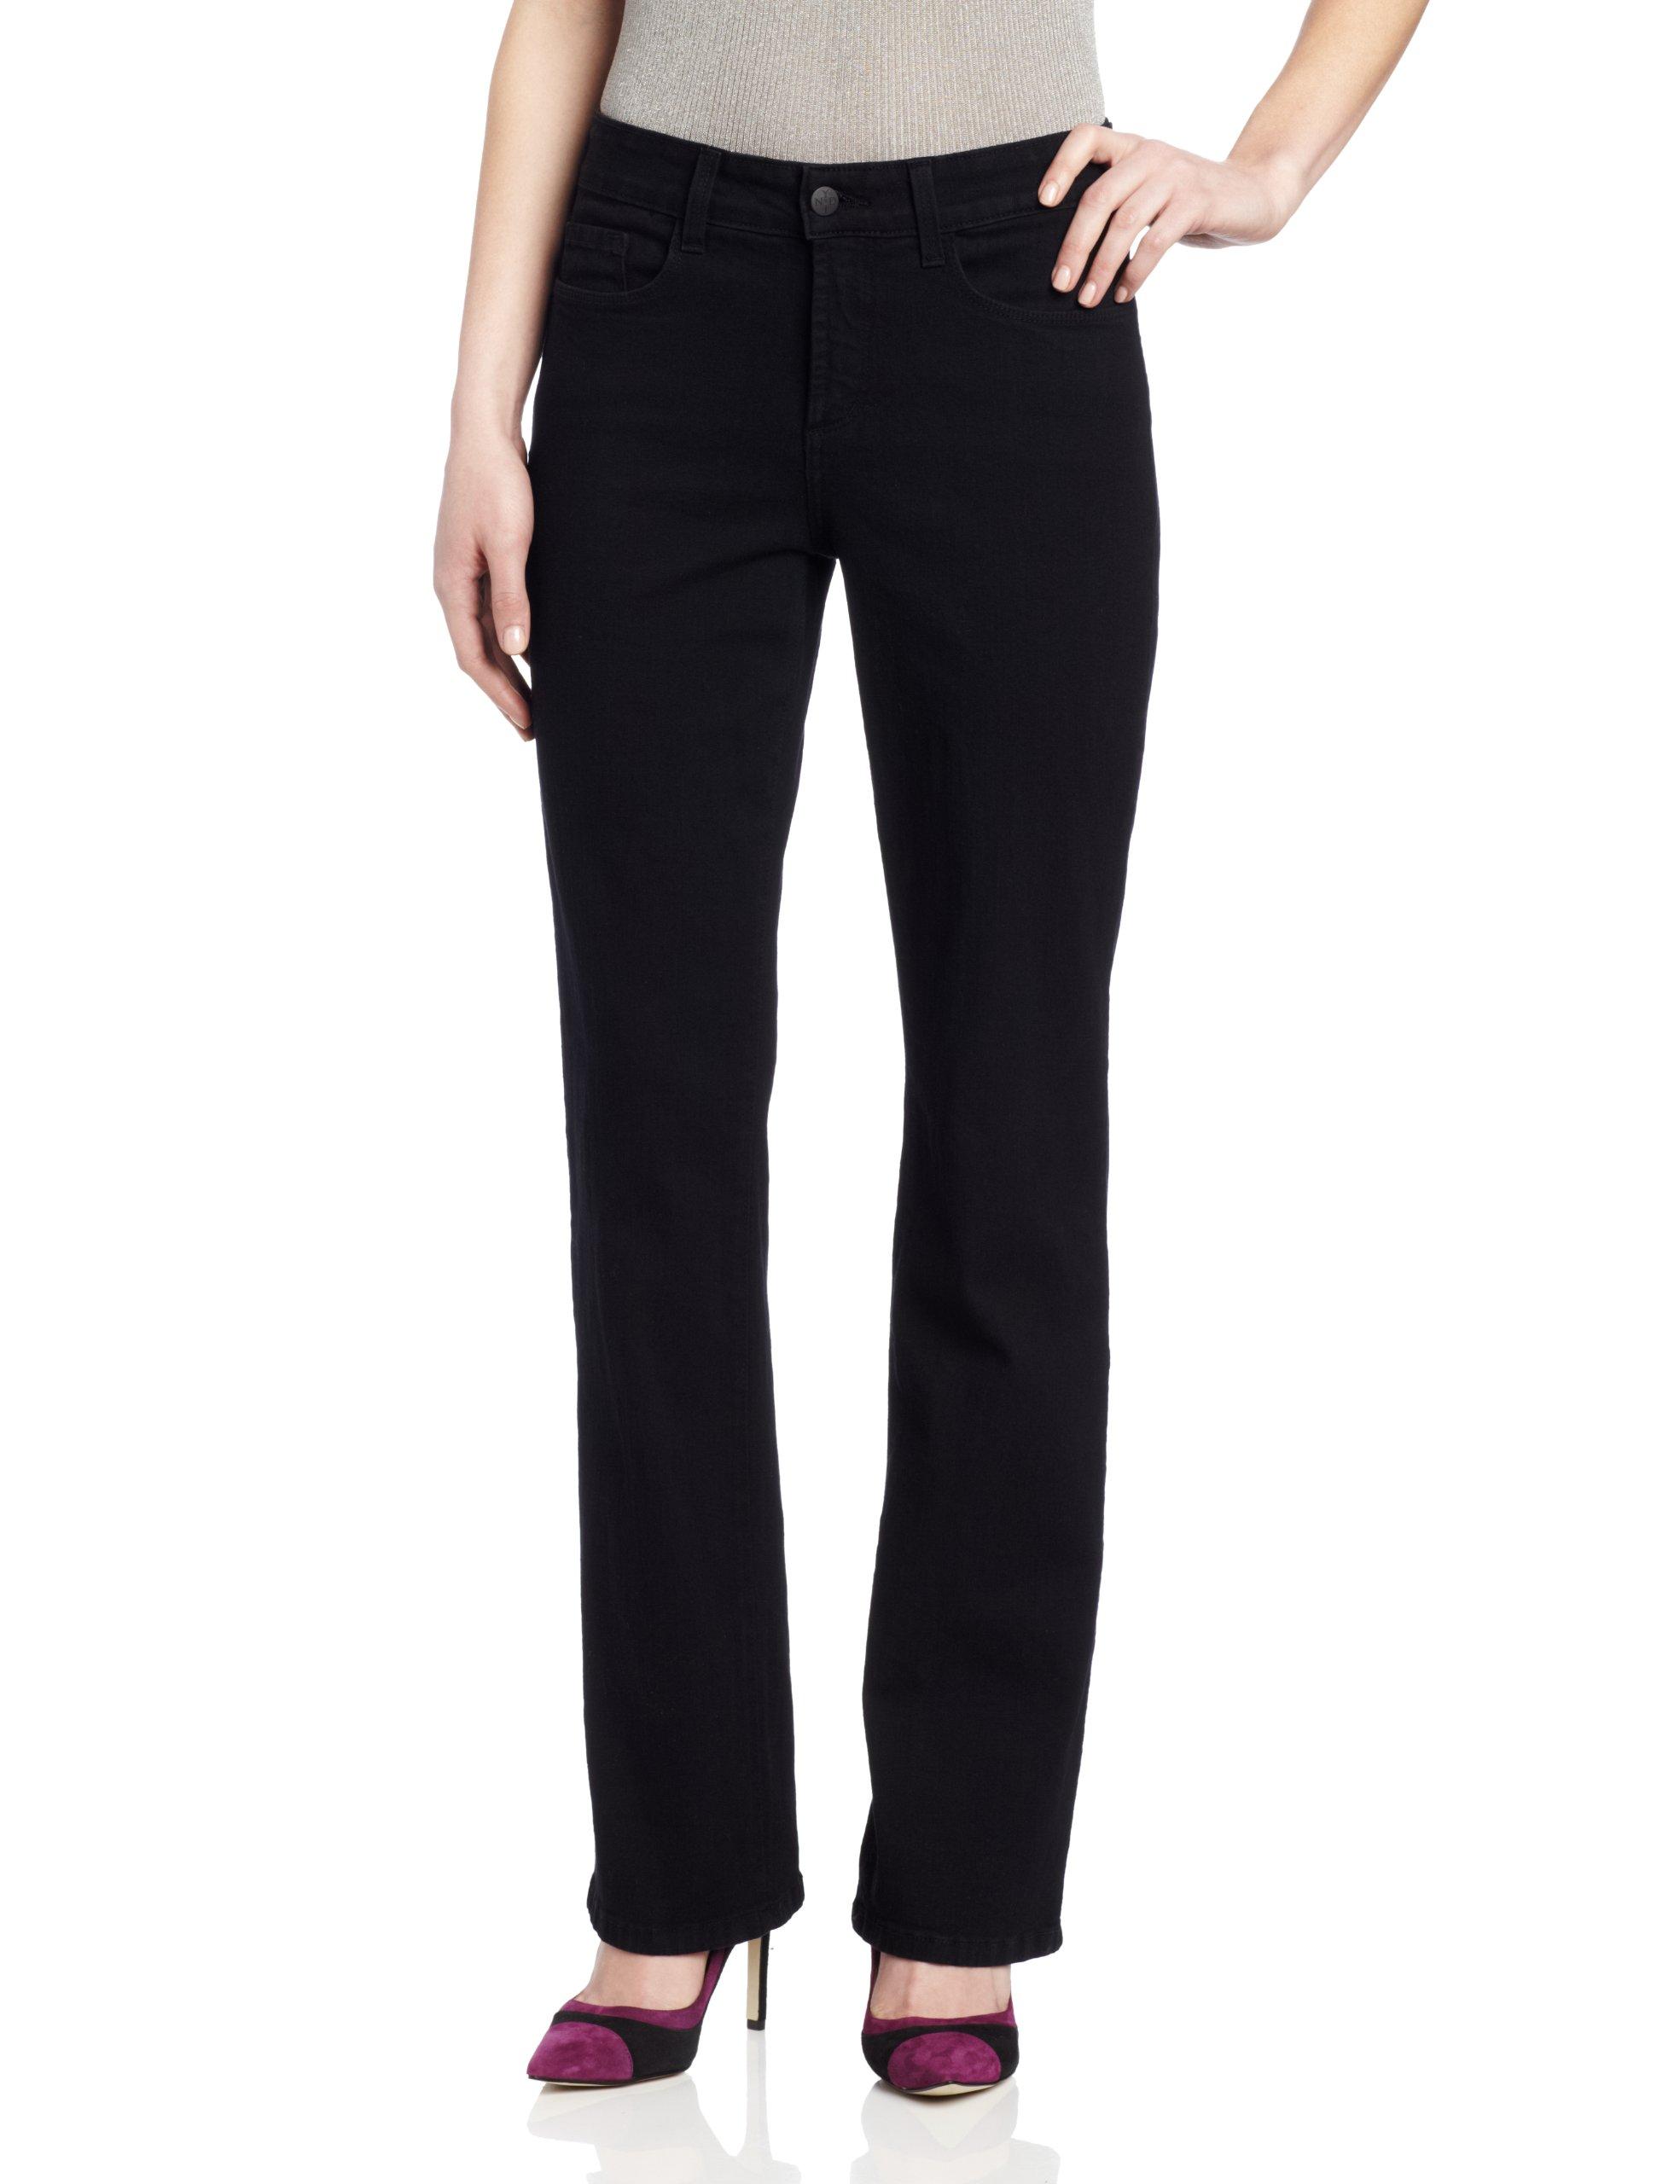 NYDJ Women's Petite Barbara Bootcut Jeans, Black, 14P